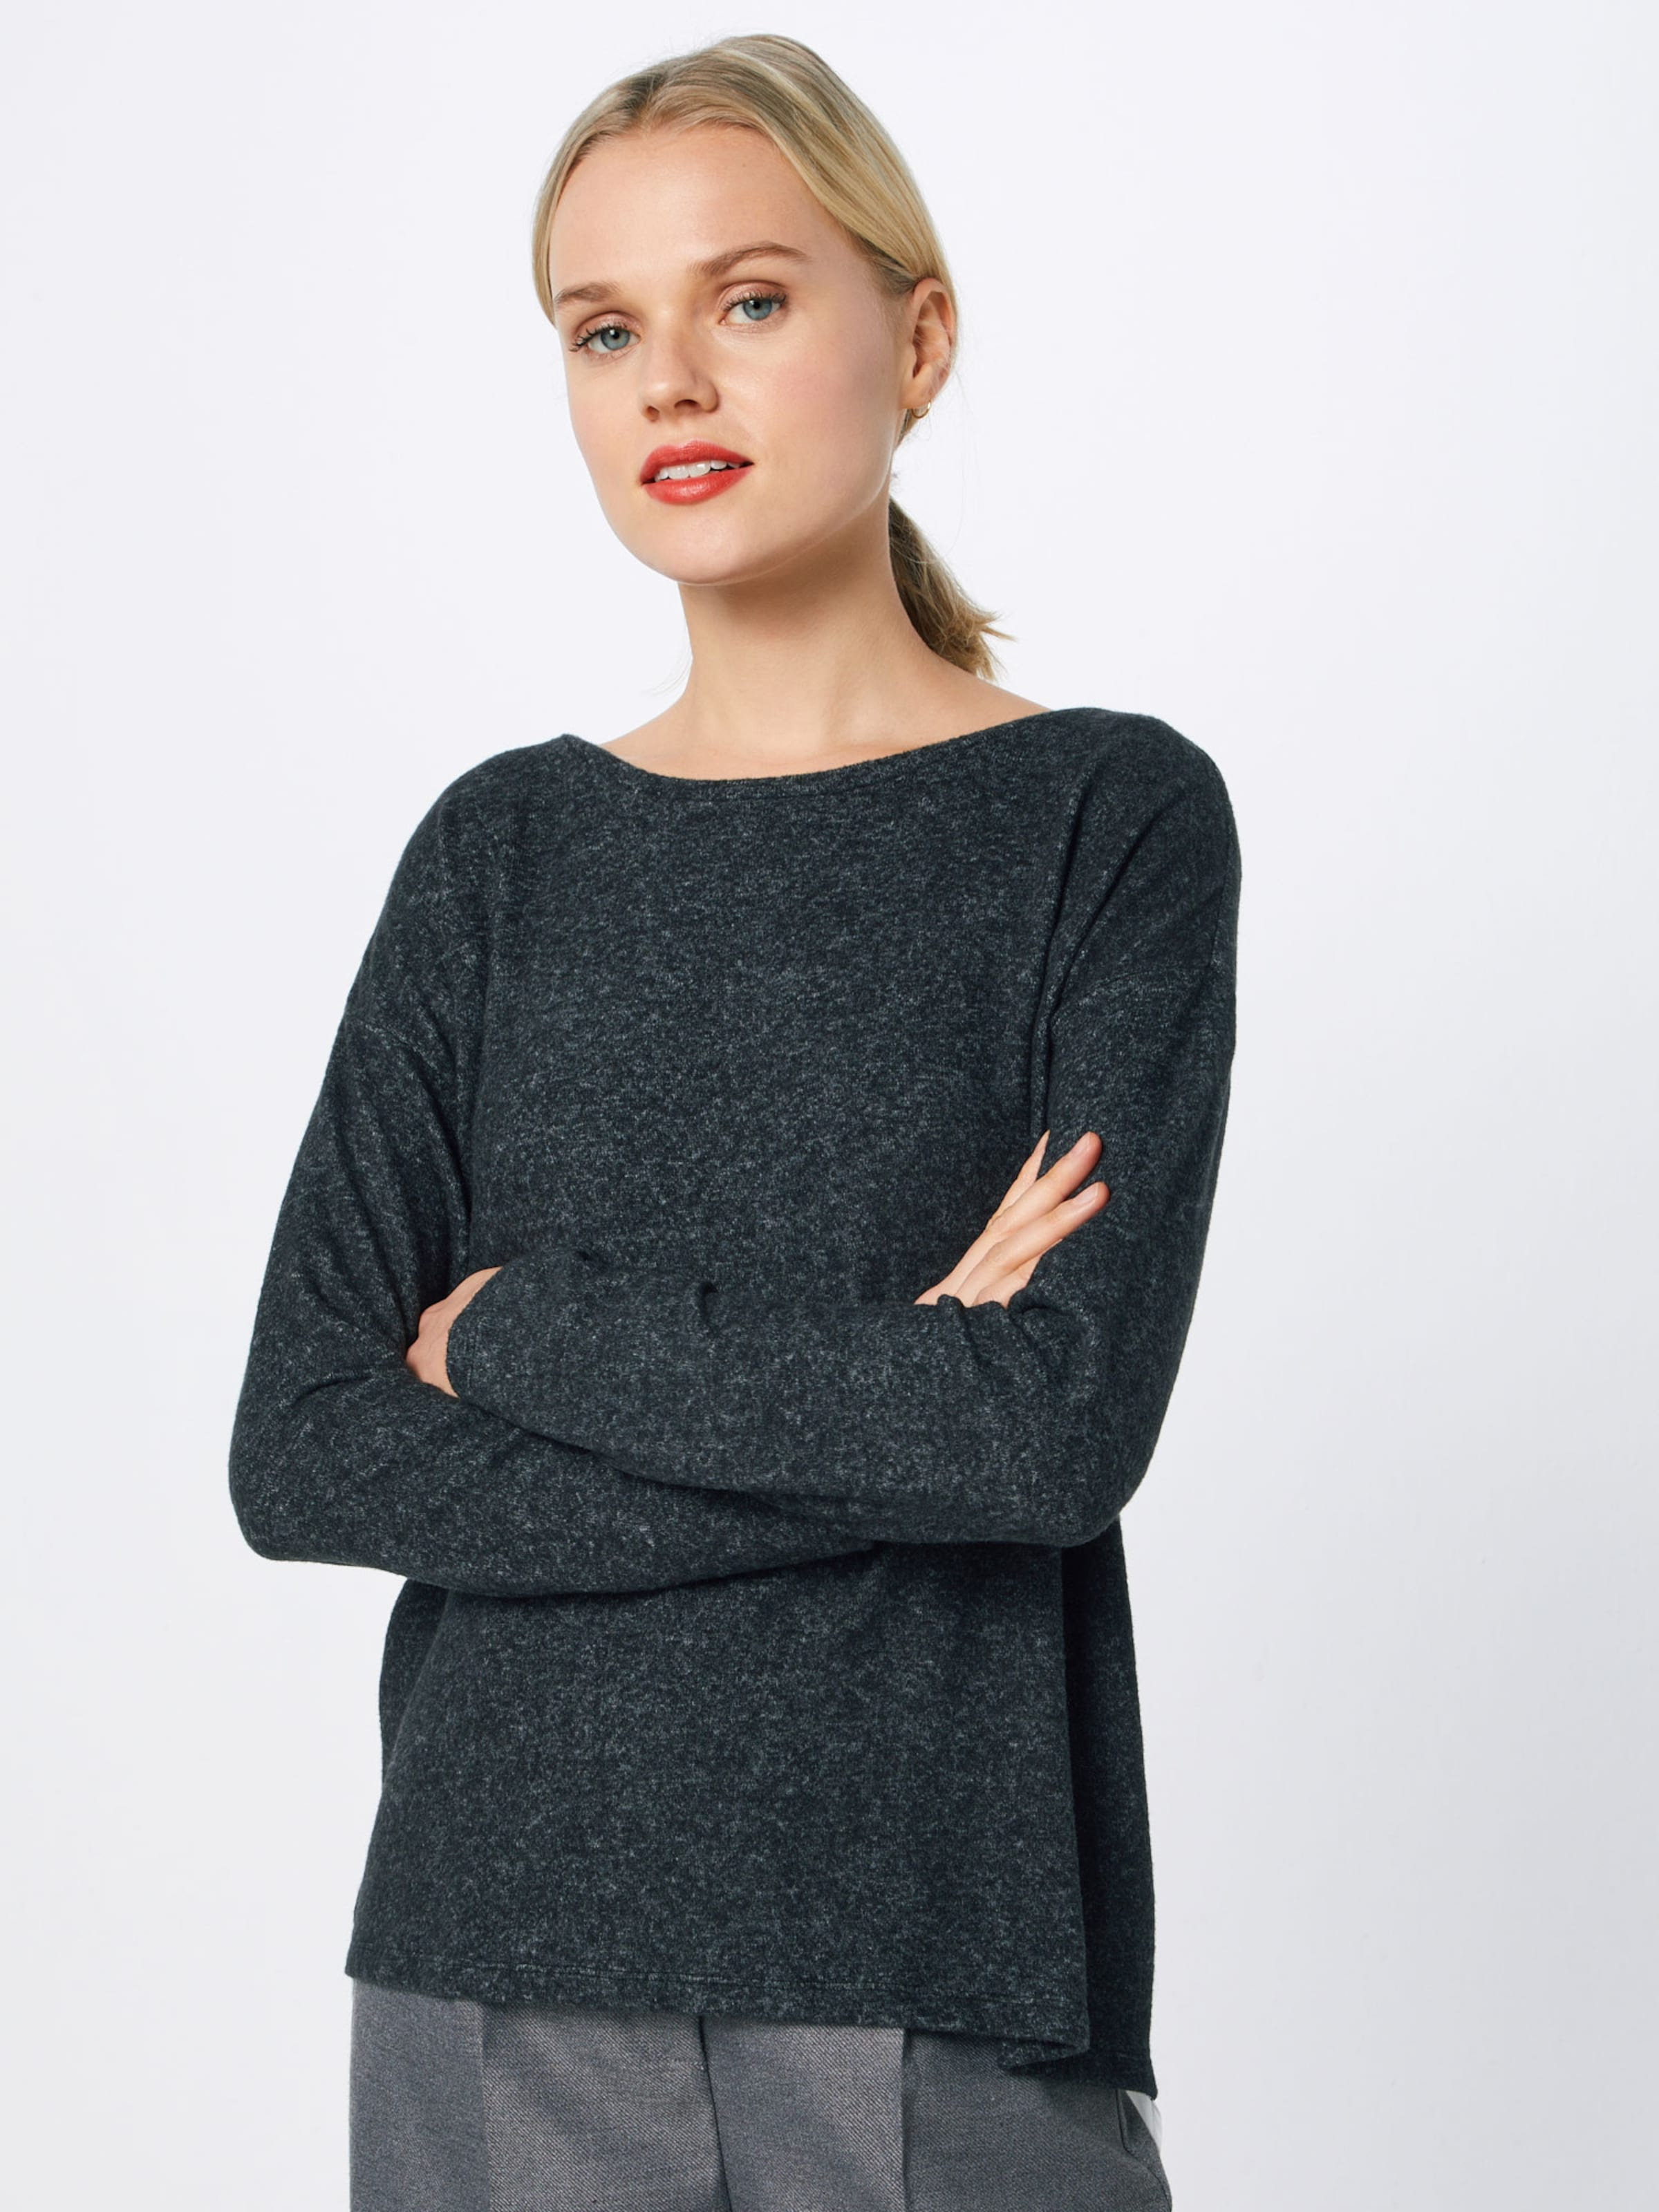 shirts' Shirt By Esprit 'woven Hem Edc T In Schwarz jcR5L4A3q